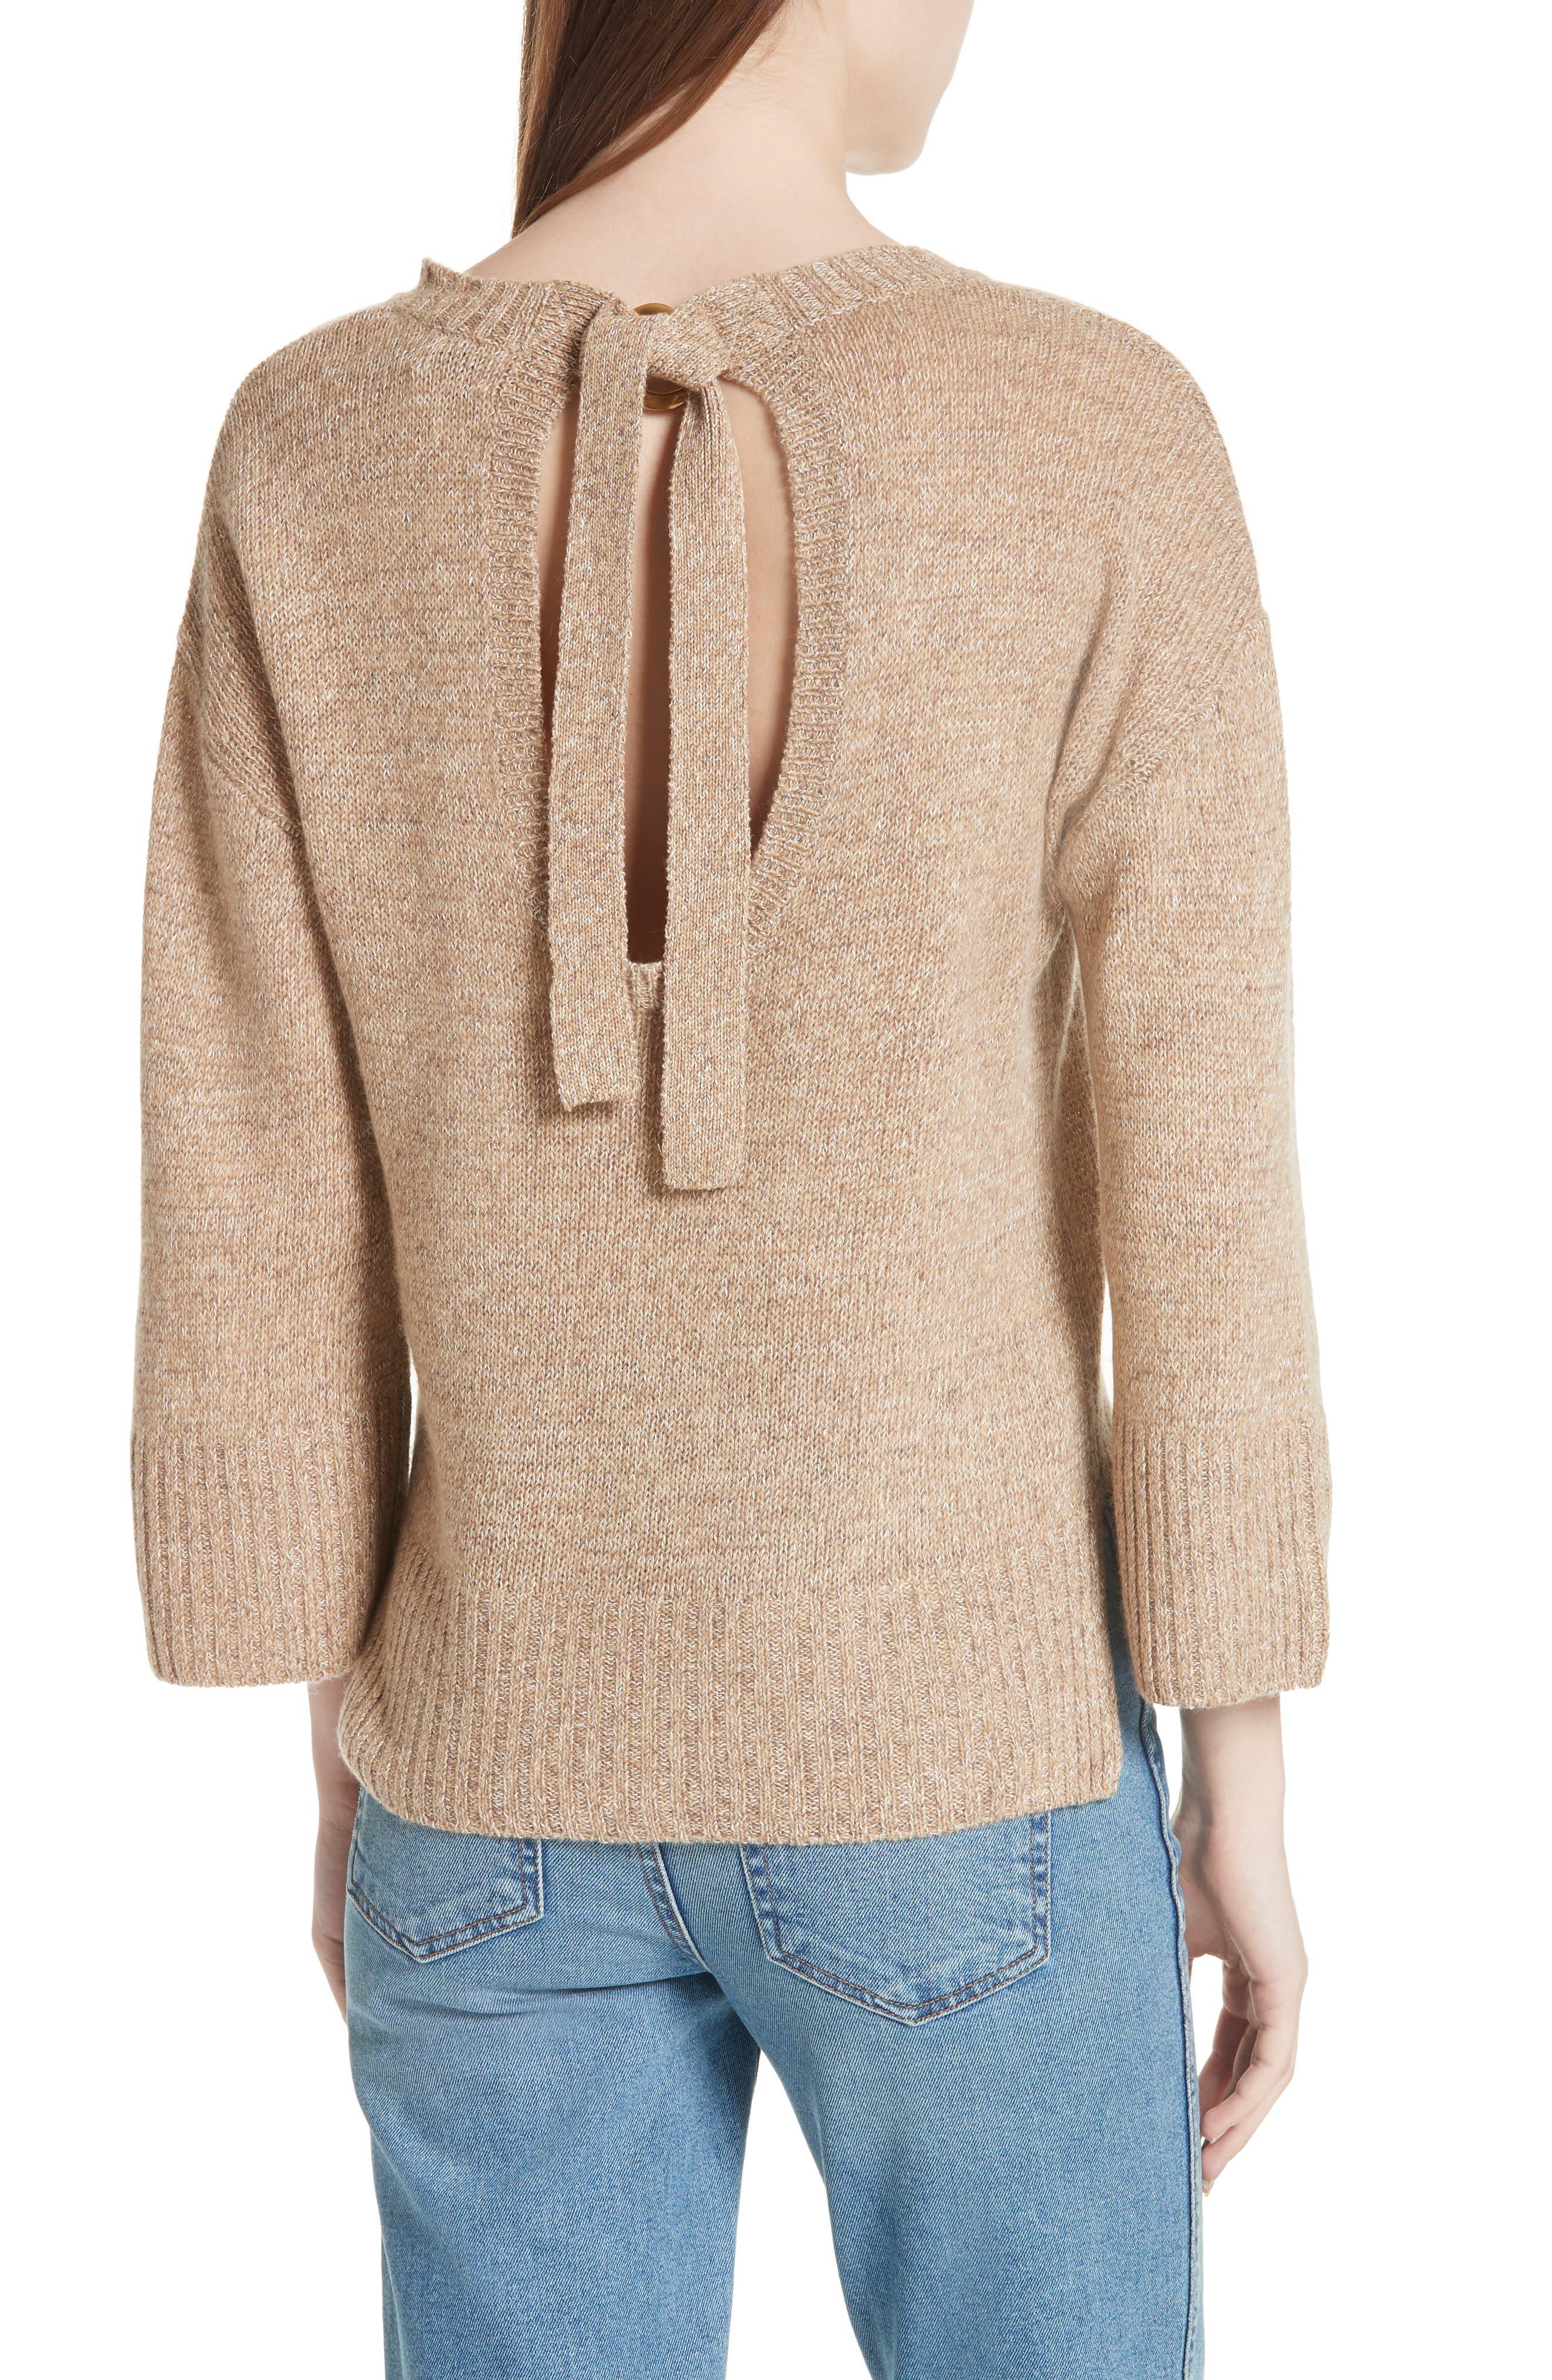 Keyhole Back Sweater,                             Alternate thumbnail 2, color,                             Camel